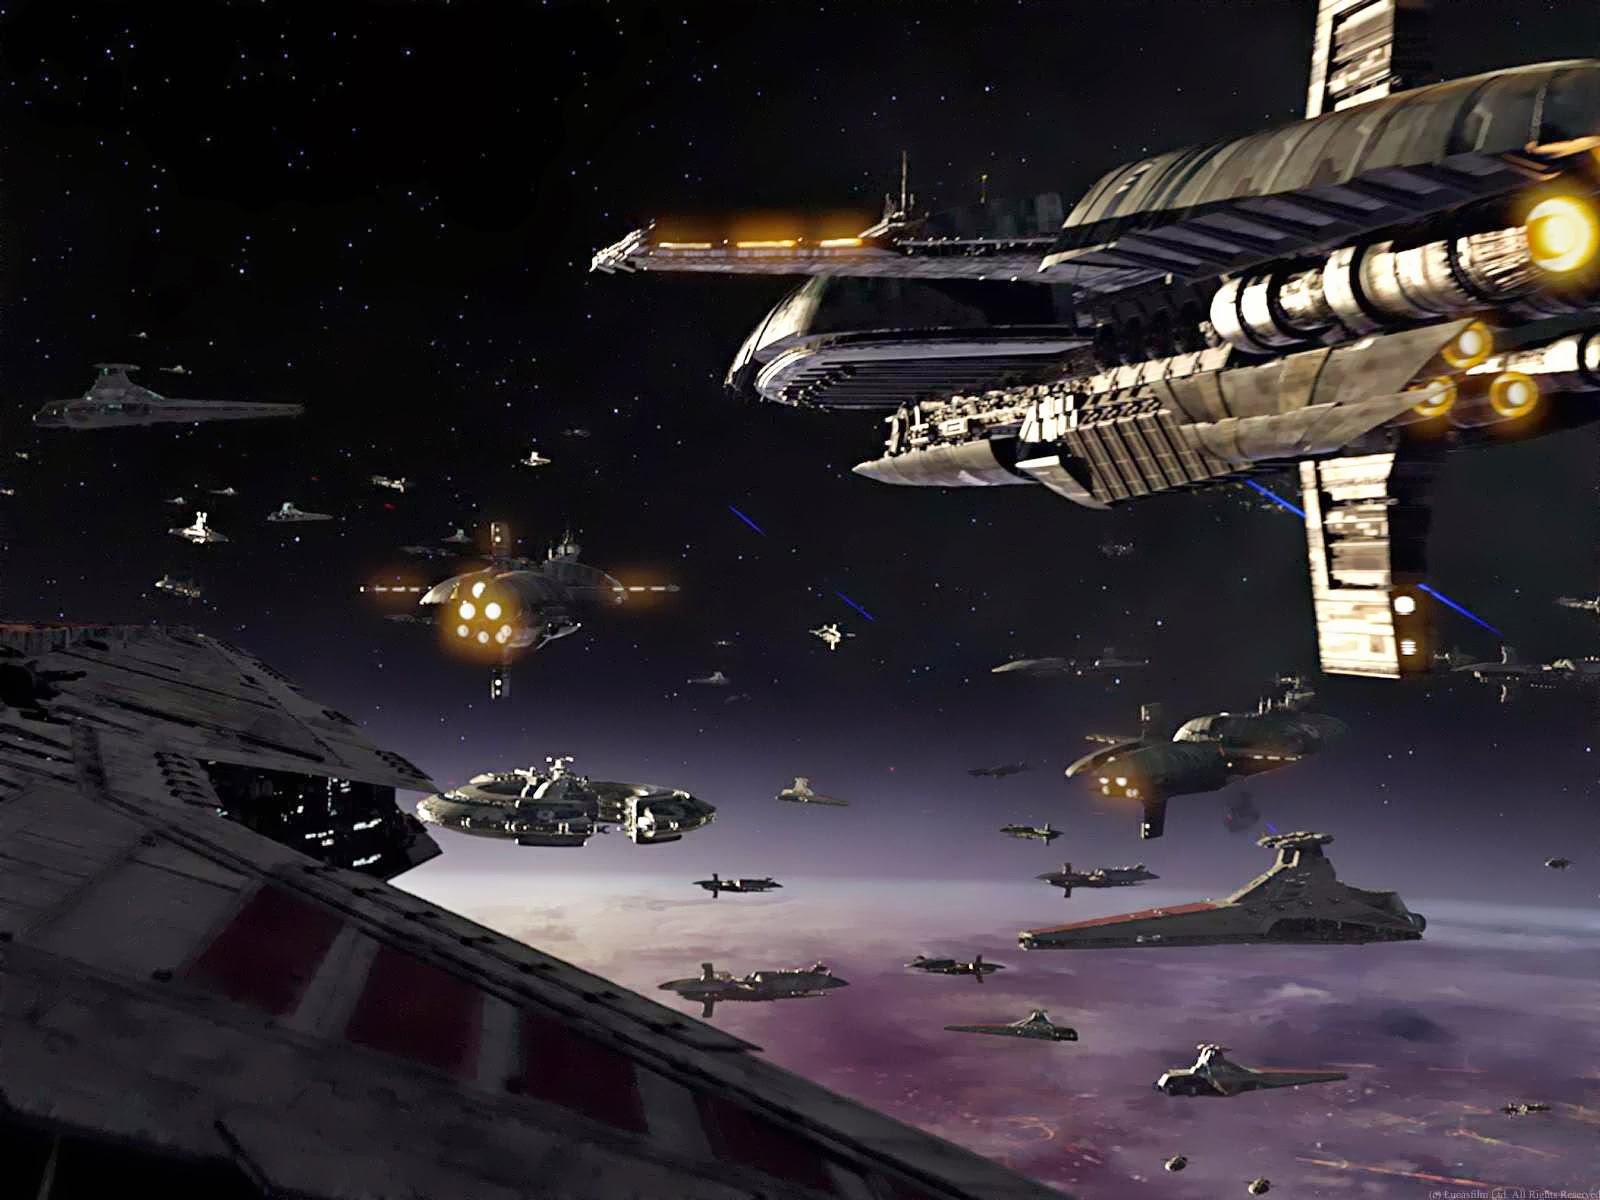 Space Battle Wallpaper Space Wallpaper 1600x1200